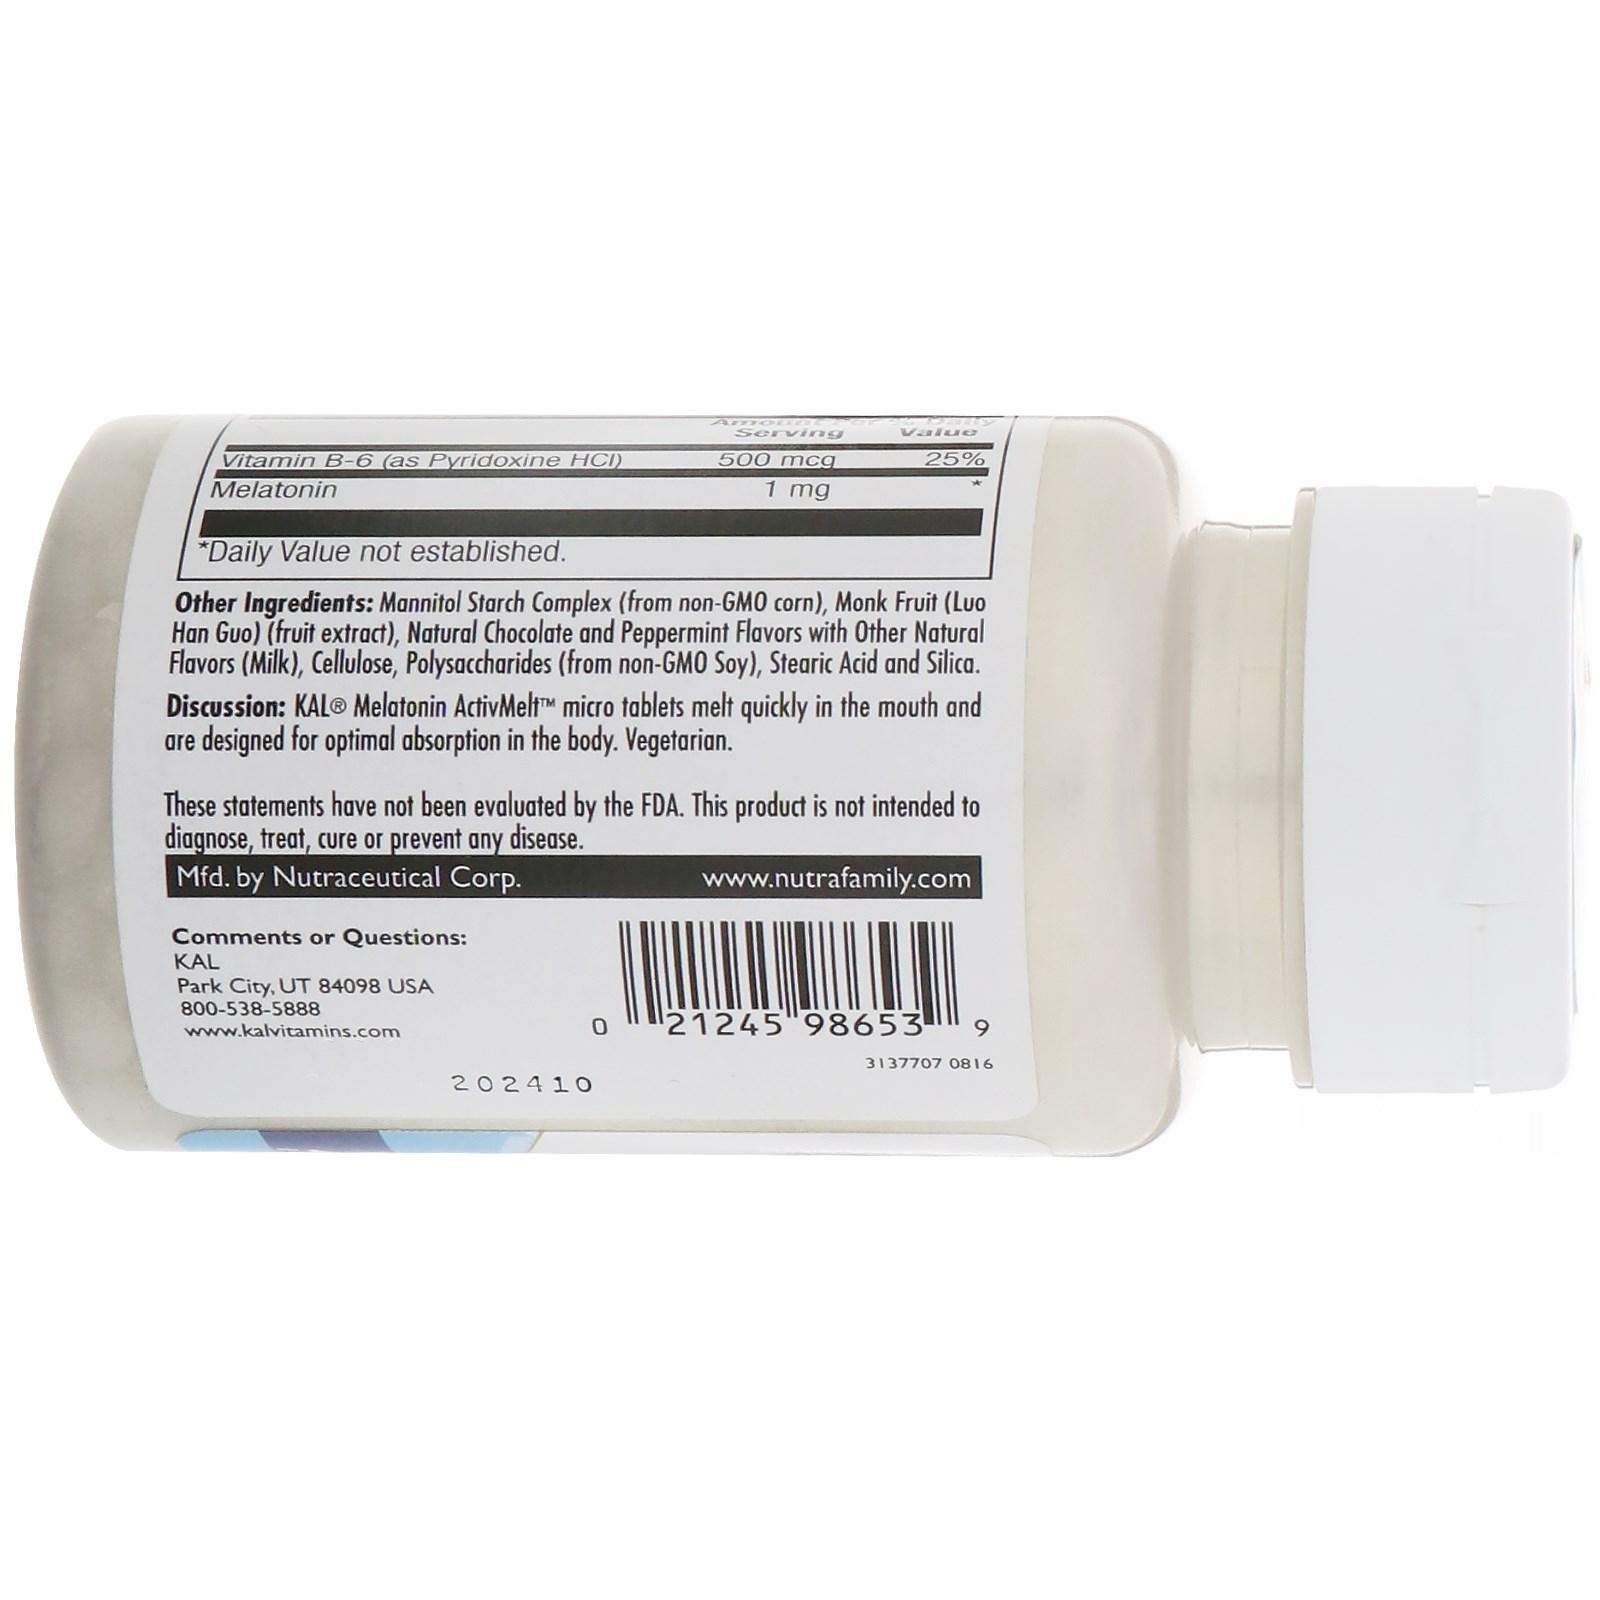 Kal Melatonin 3 Mg 120 Tablets: KAL, Melatonin, Chocolate Mint Natural Flavor, 1 Mg , 120